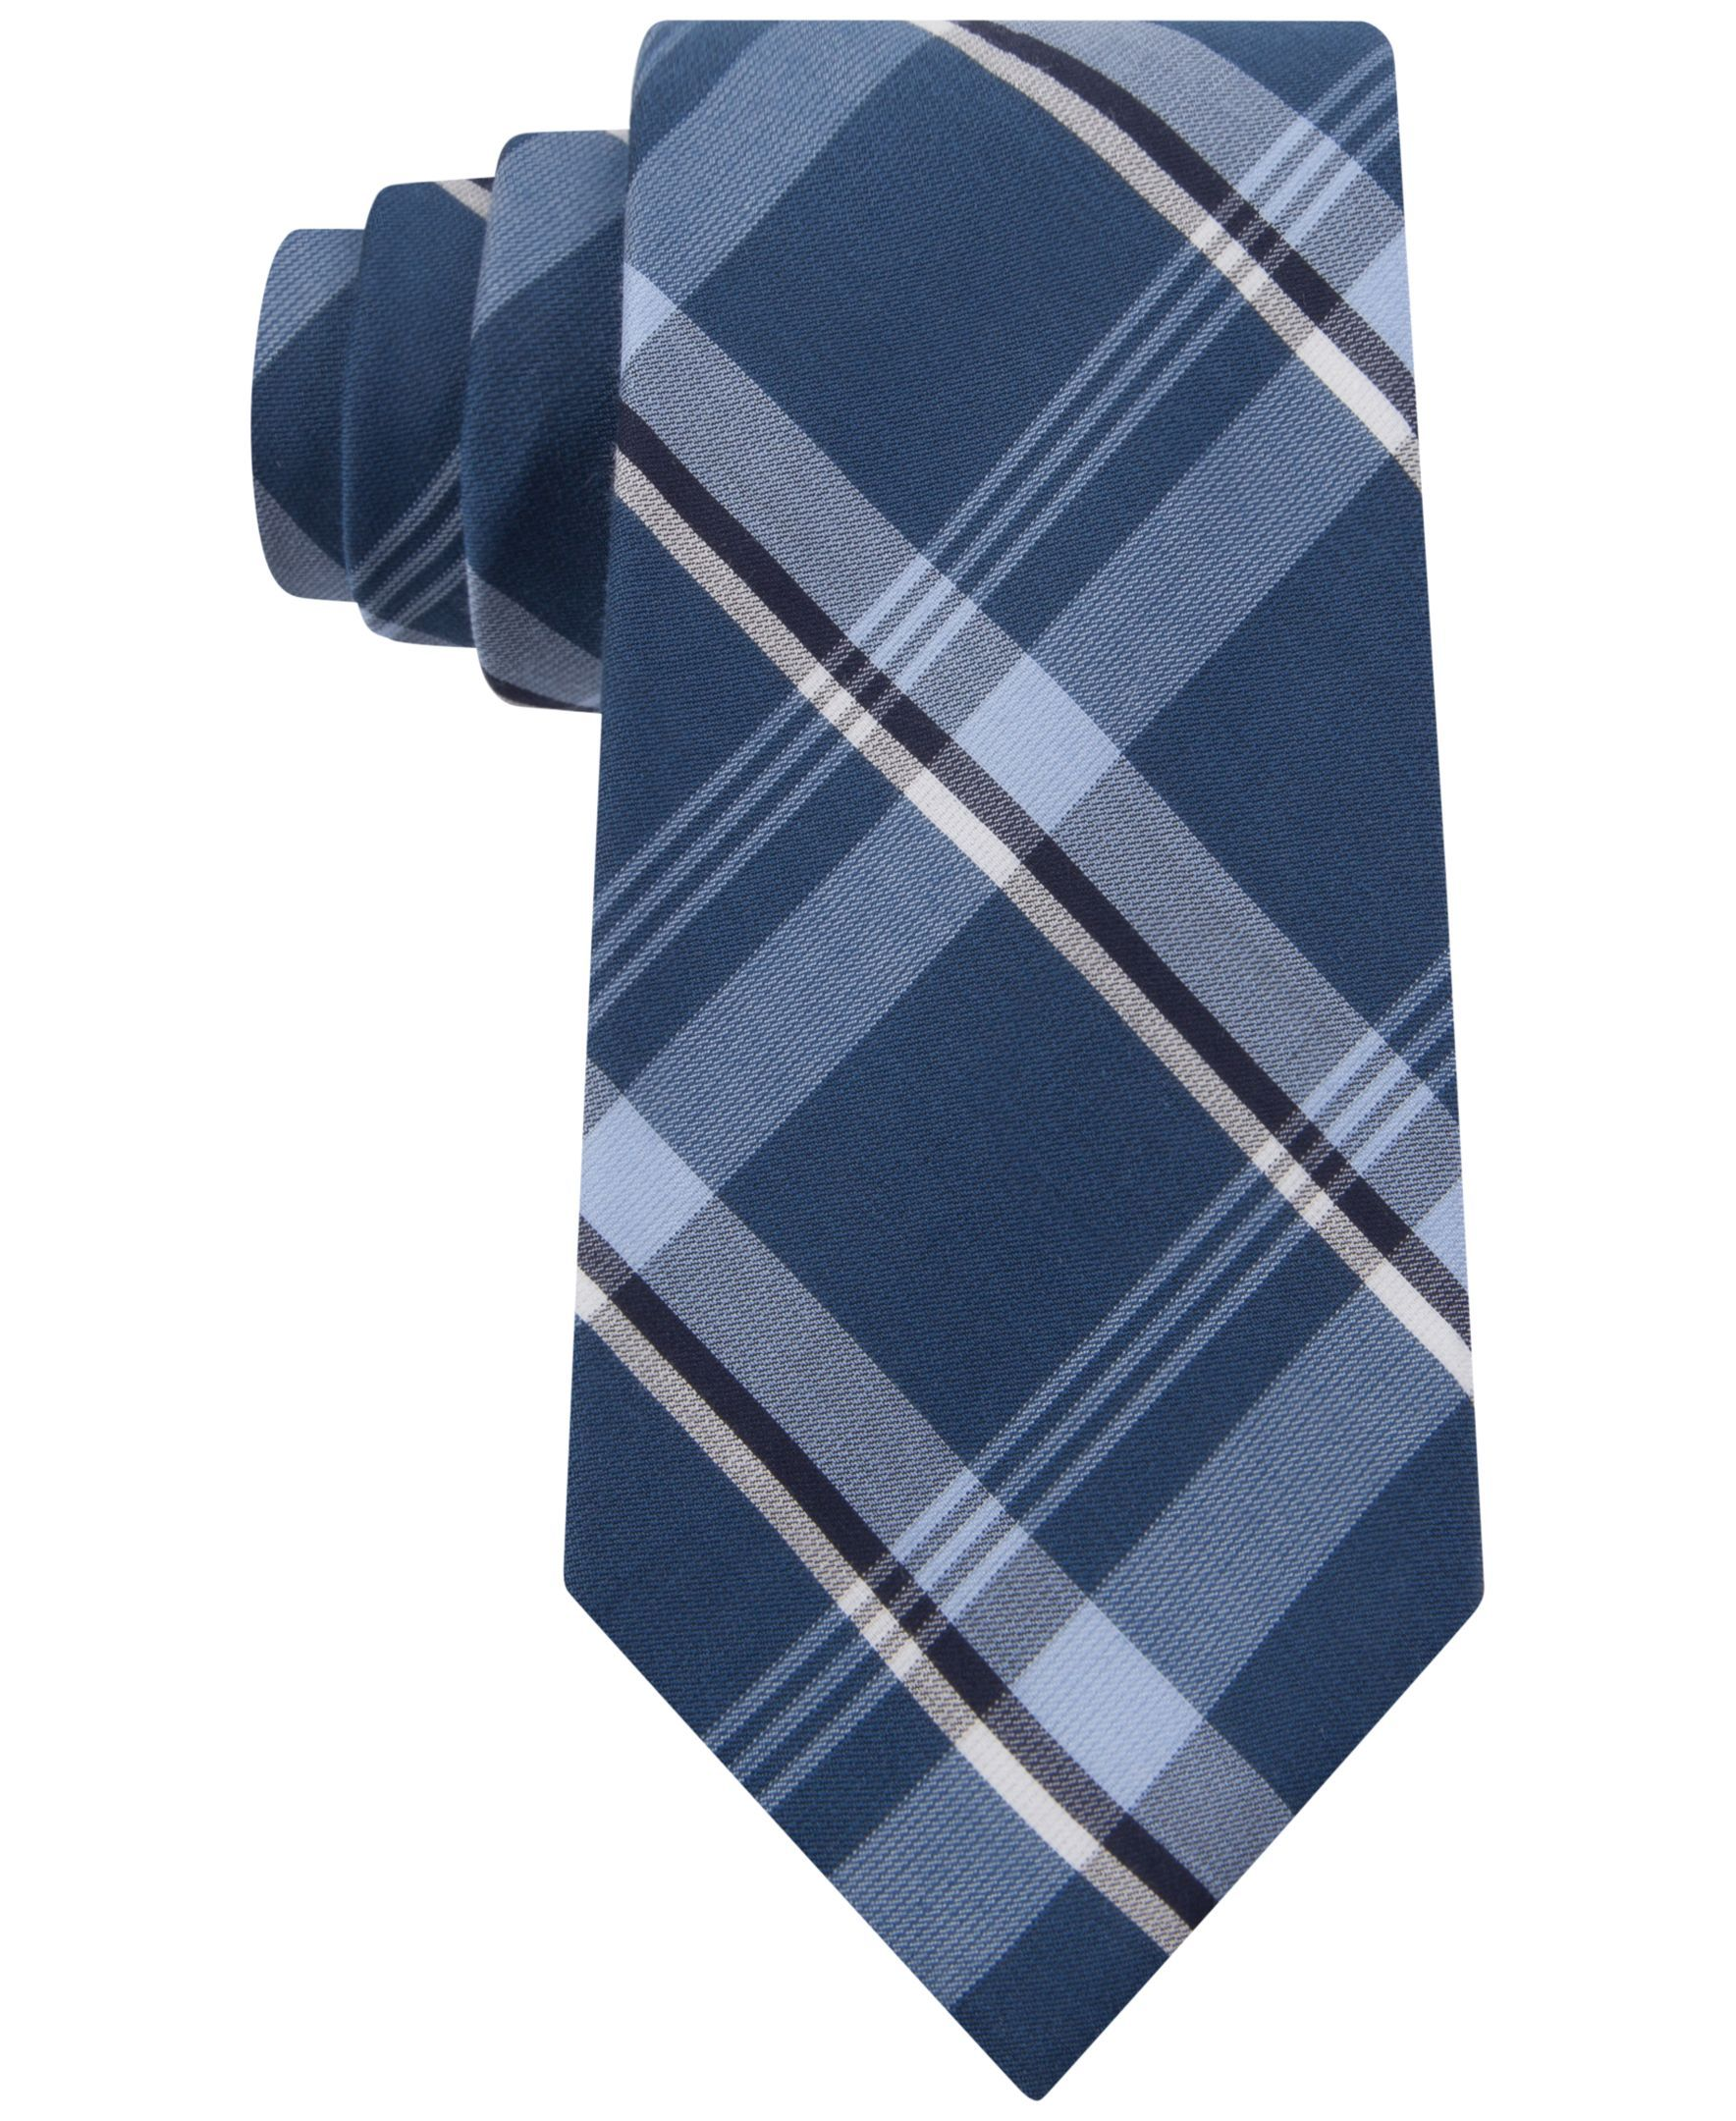 17457984790d Kenneth Cole Reaction Indigo Plaid Slim Tie | Products | Slim tie ...